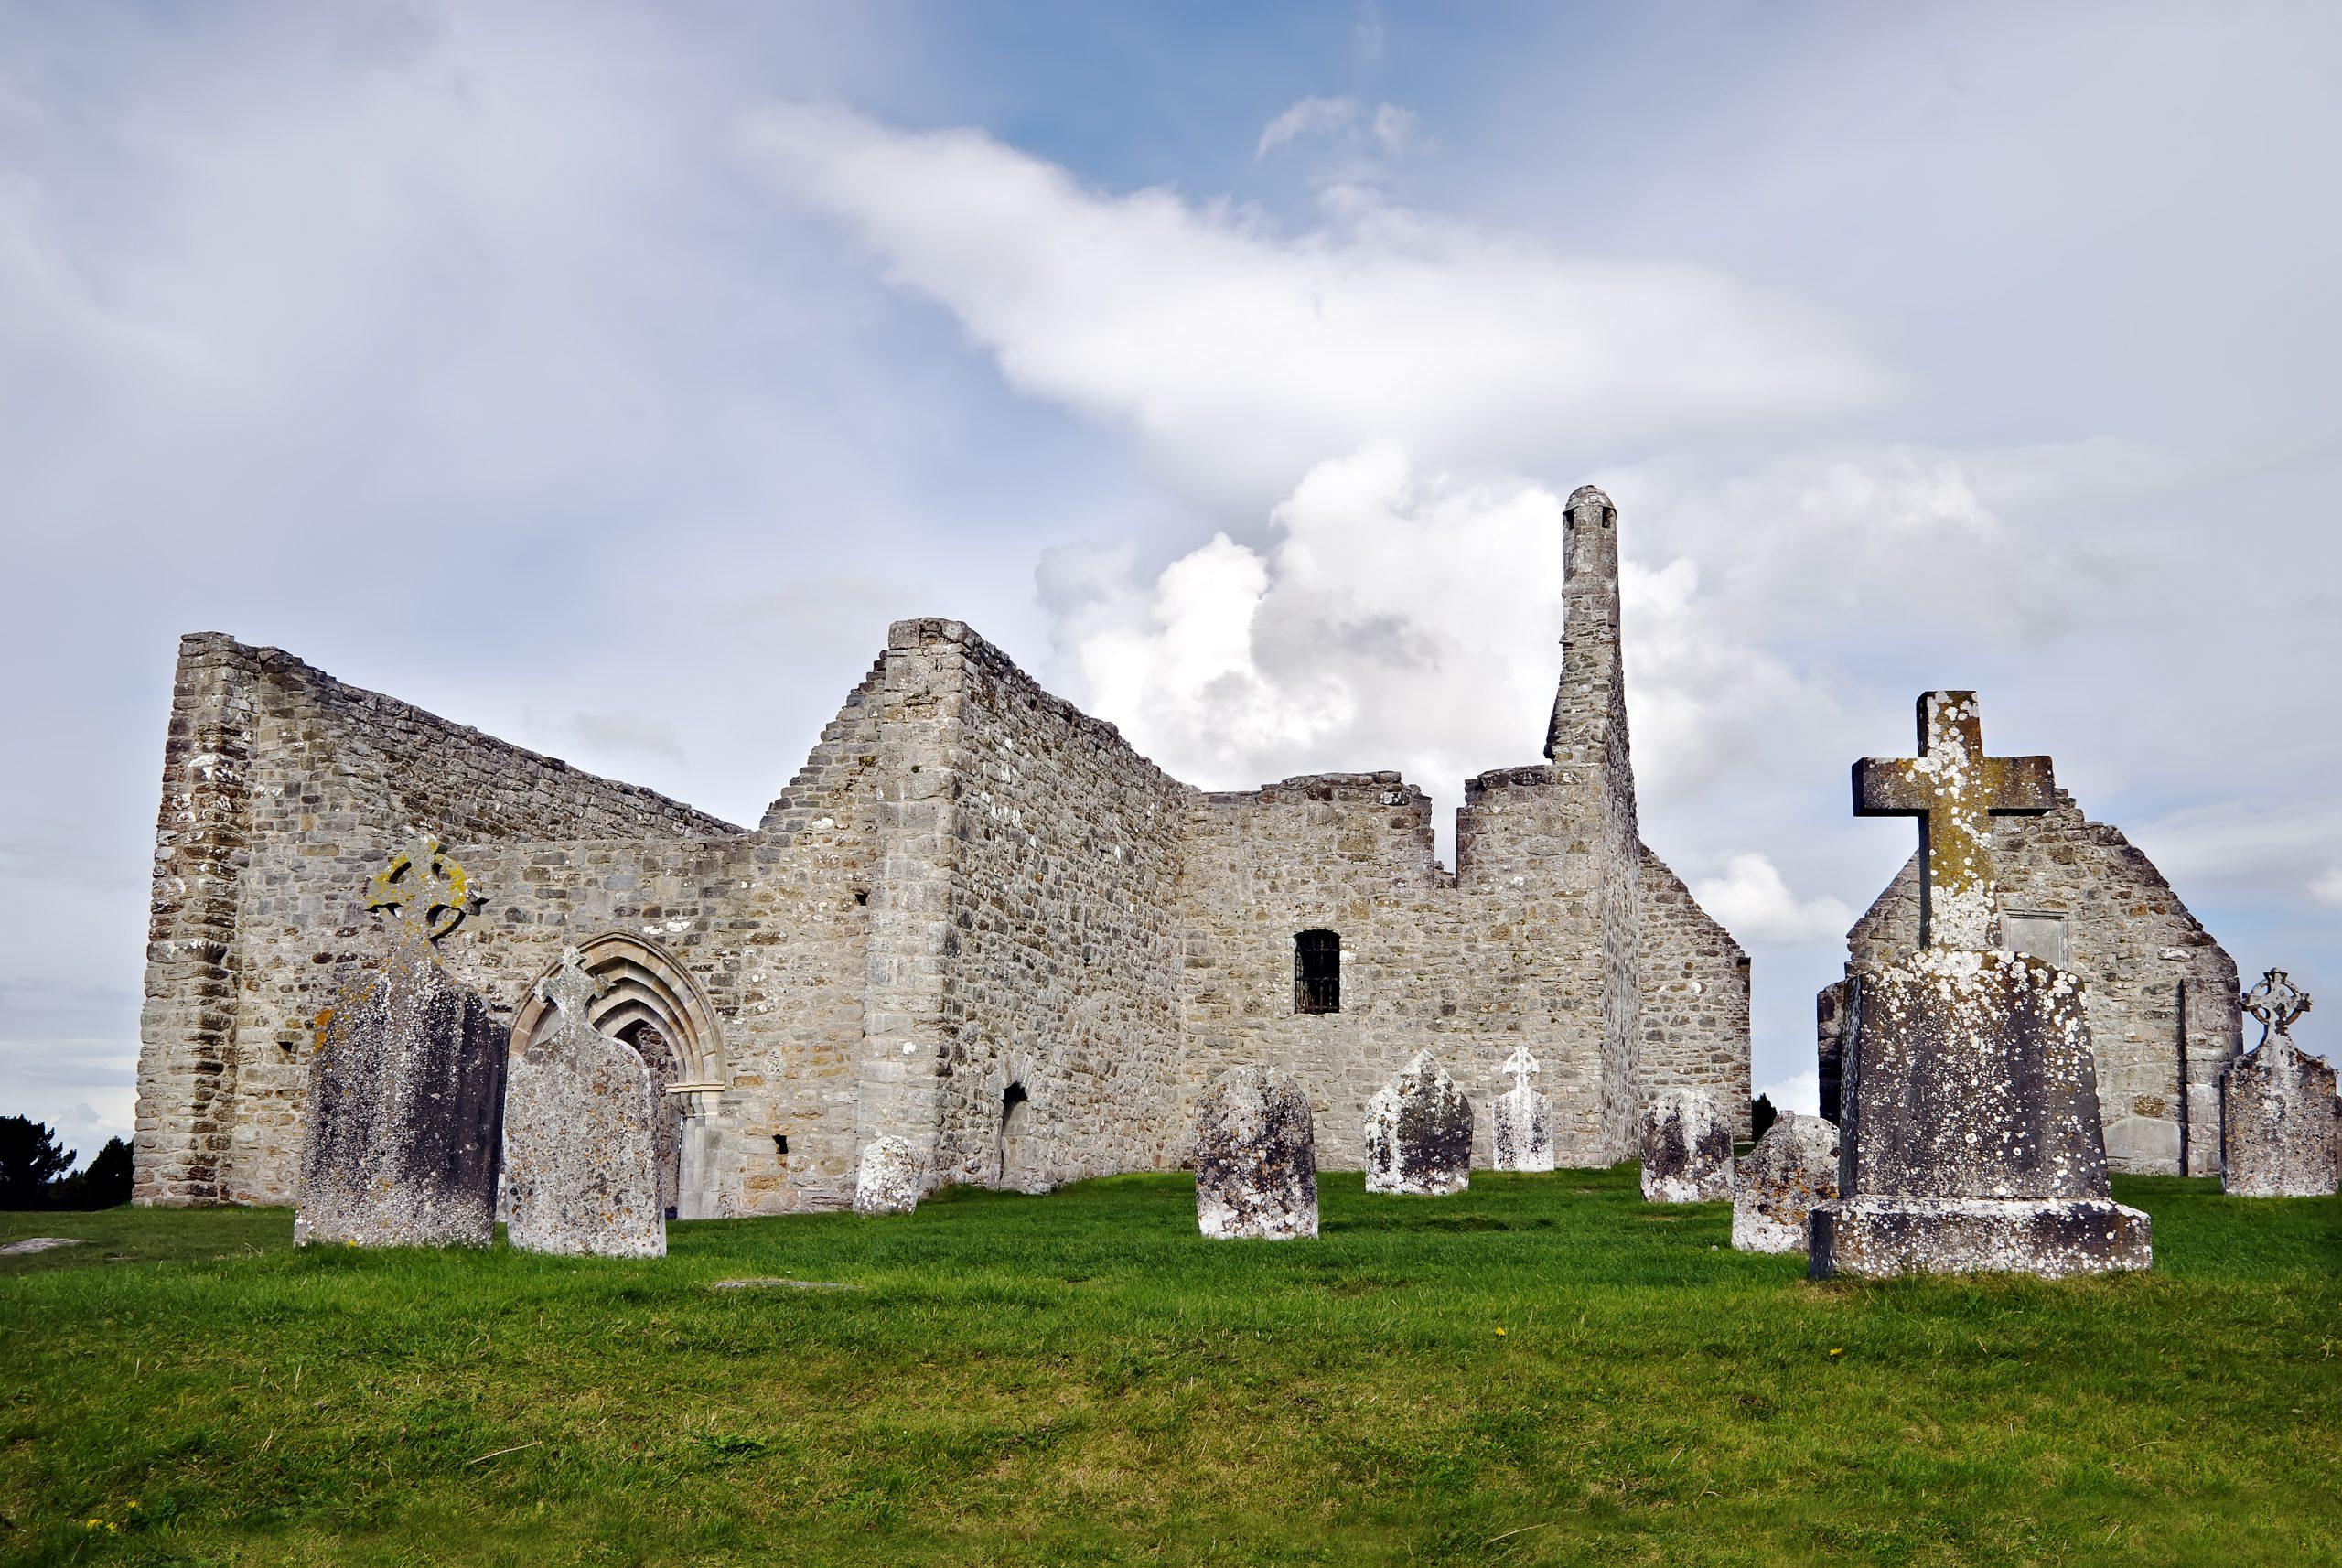 Monastery-of-Clonmacnoise-Ireland_7620696_original